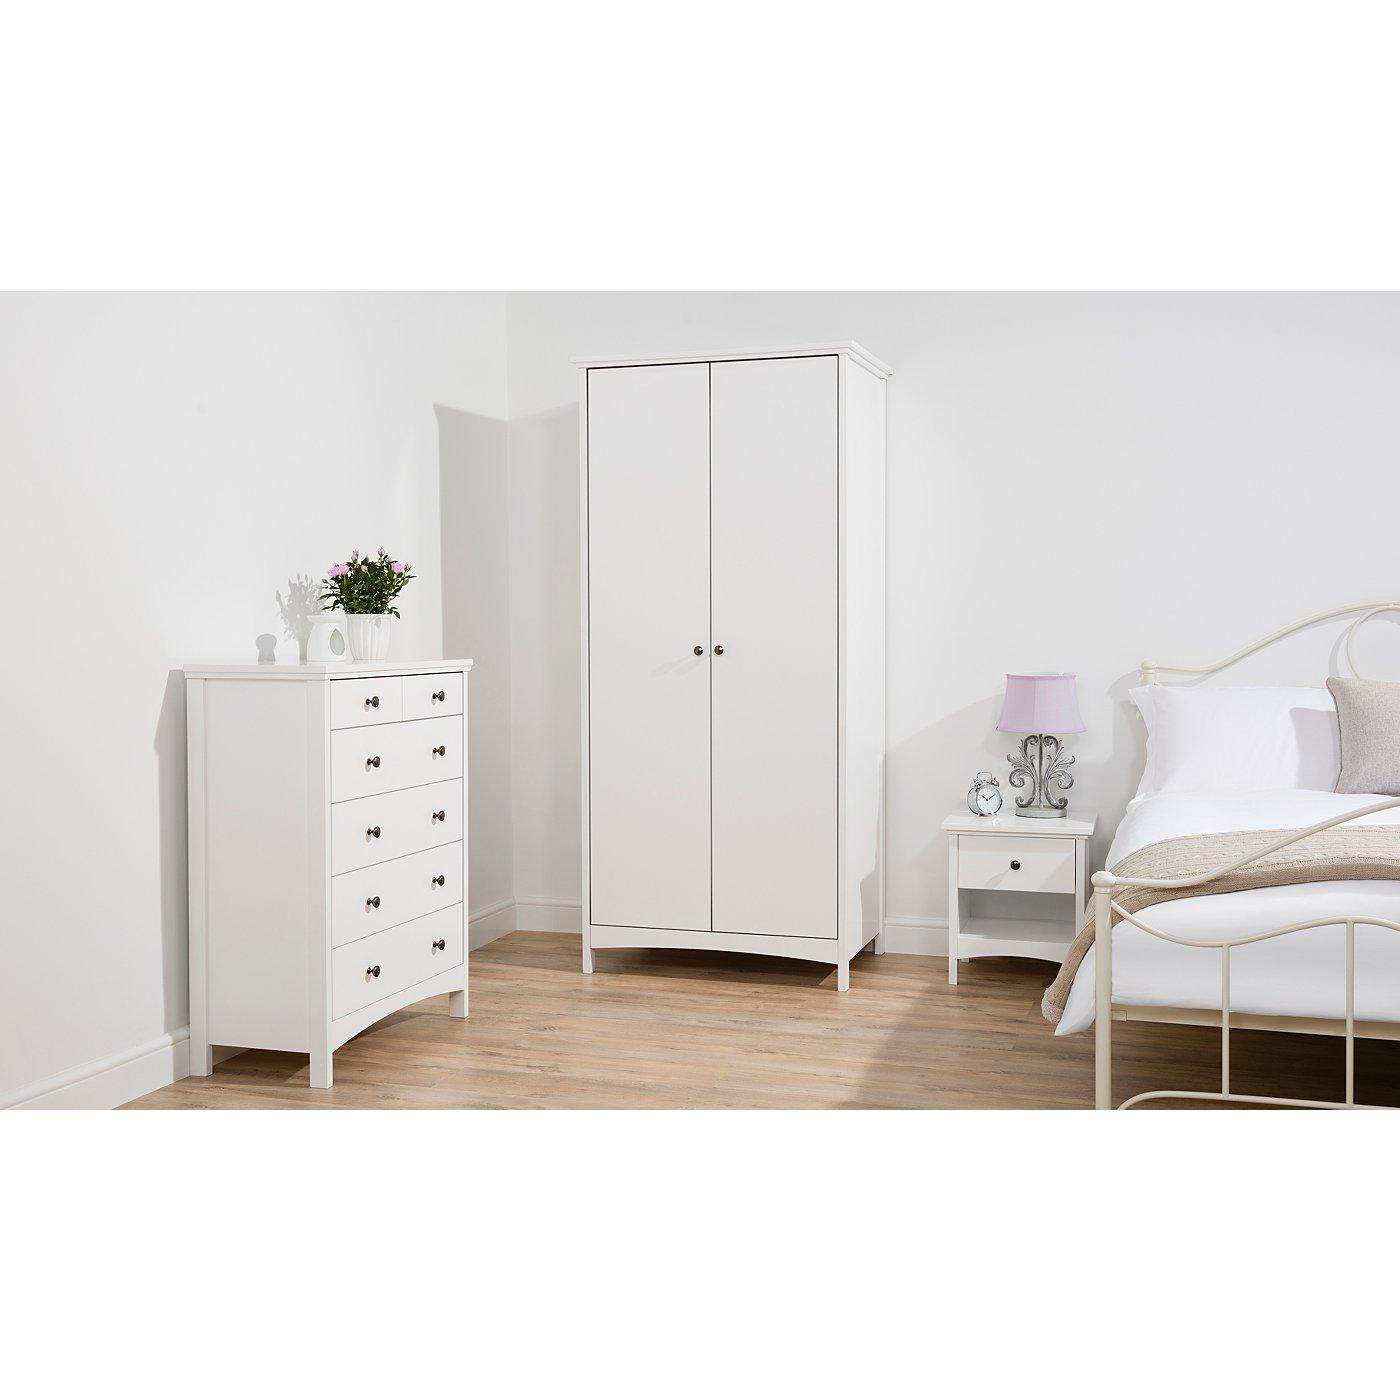 Tamsin Bedroom Furniture Range White Bedroom George At Asda